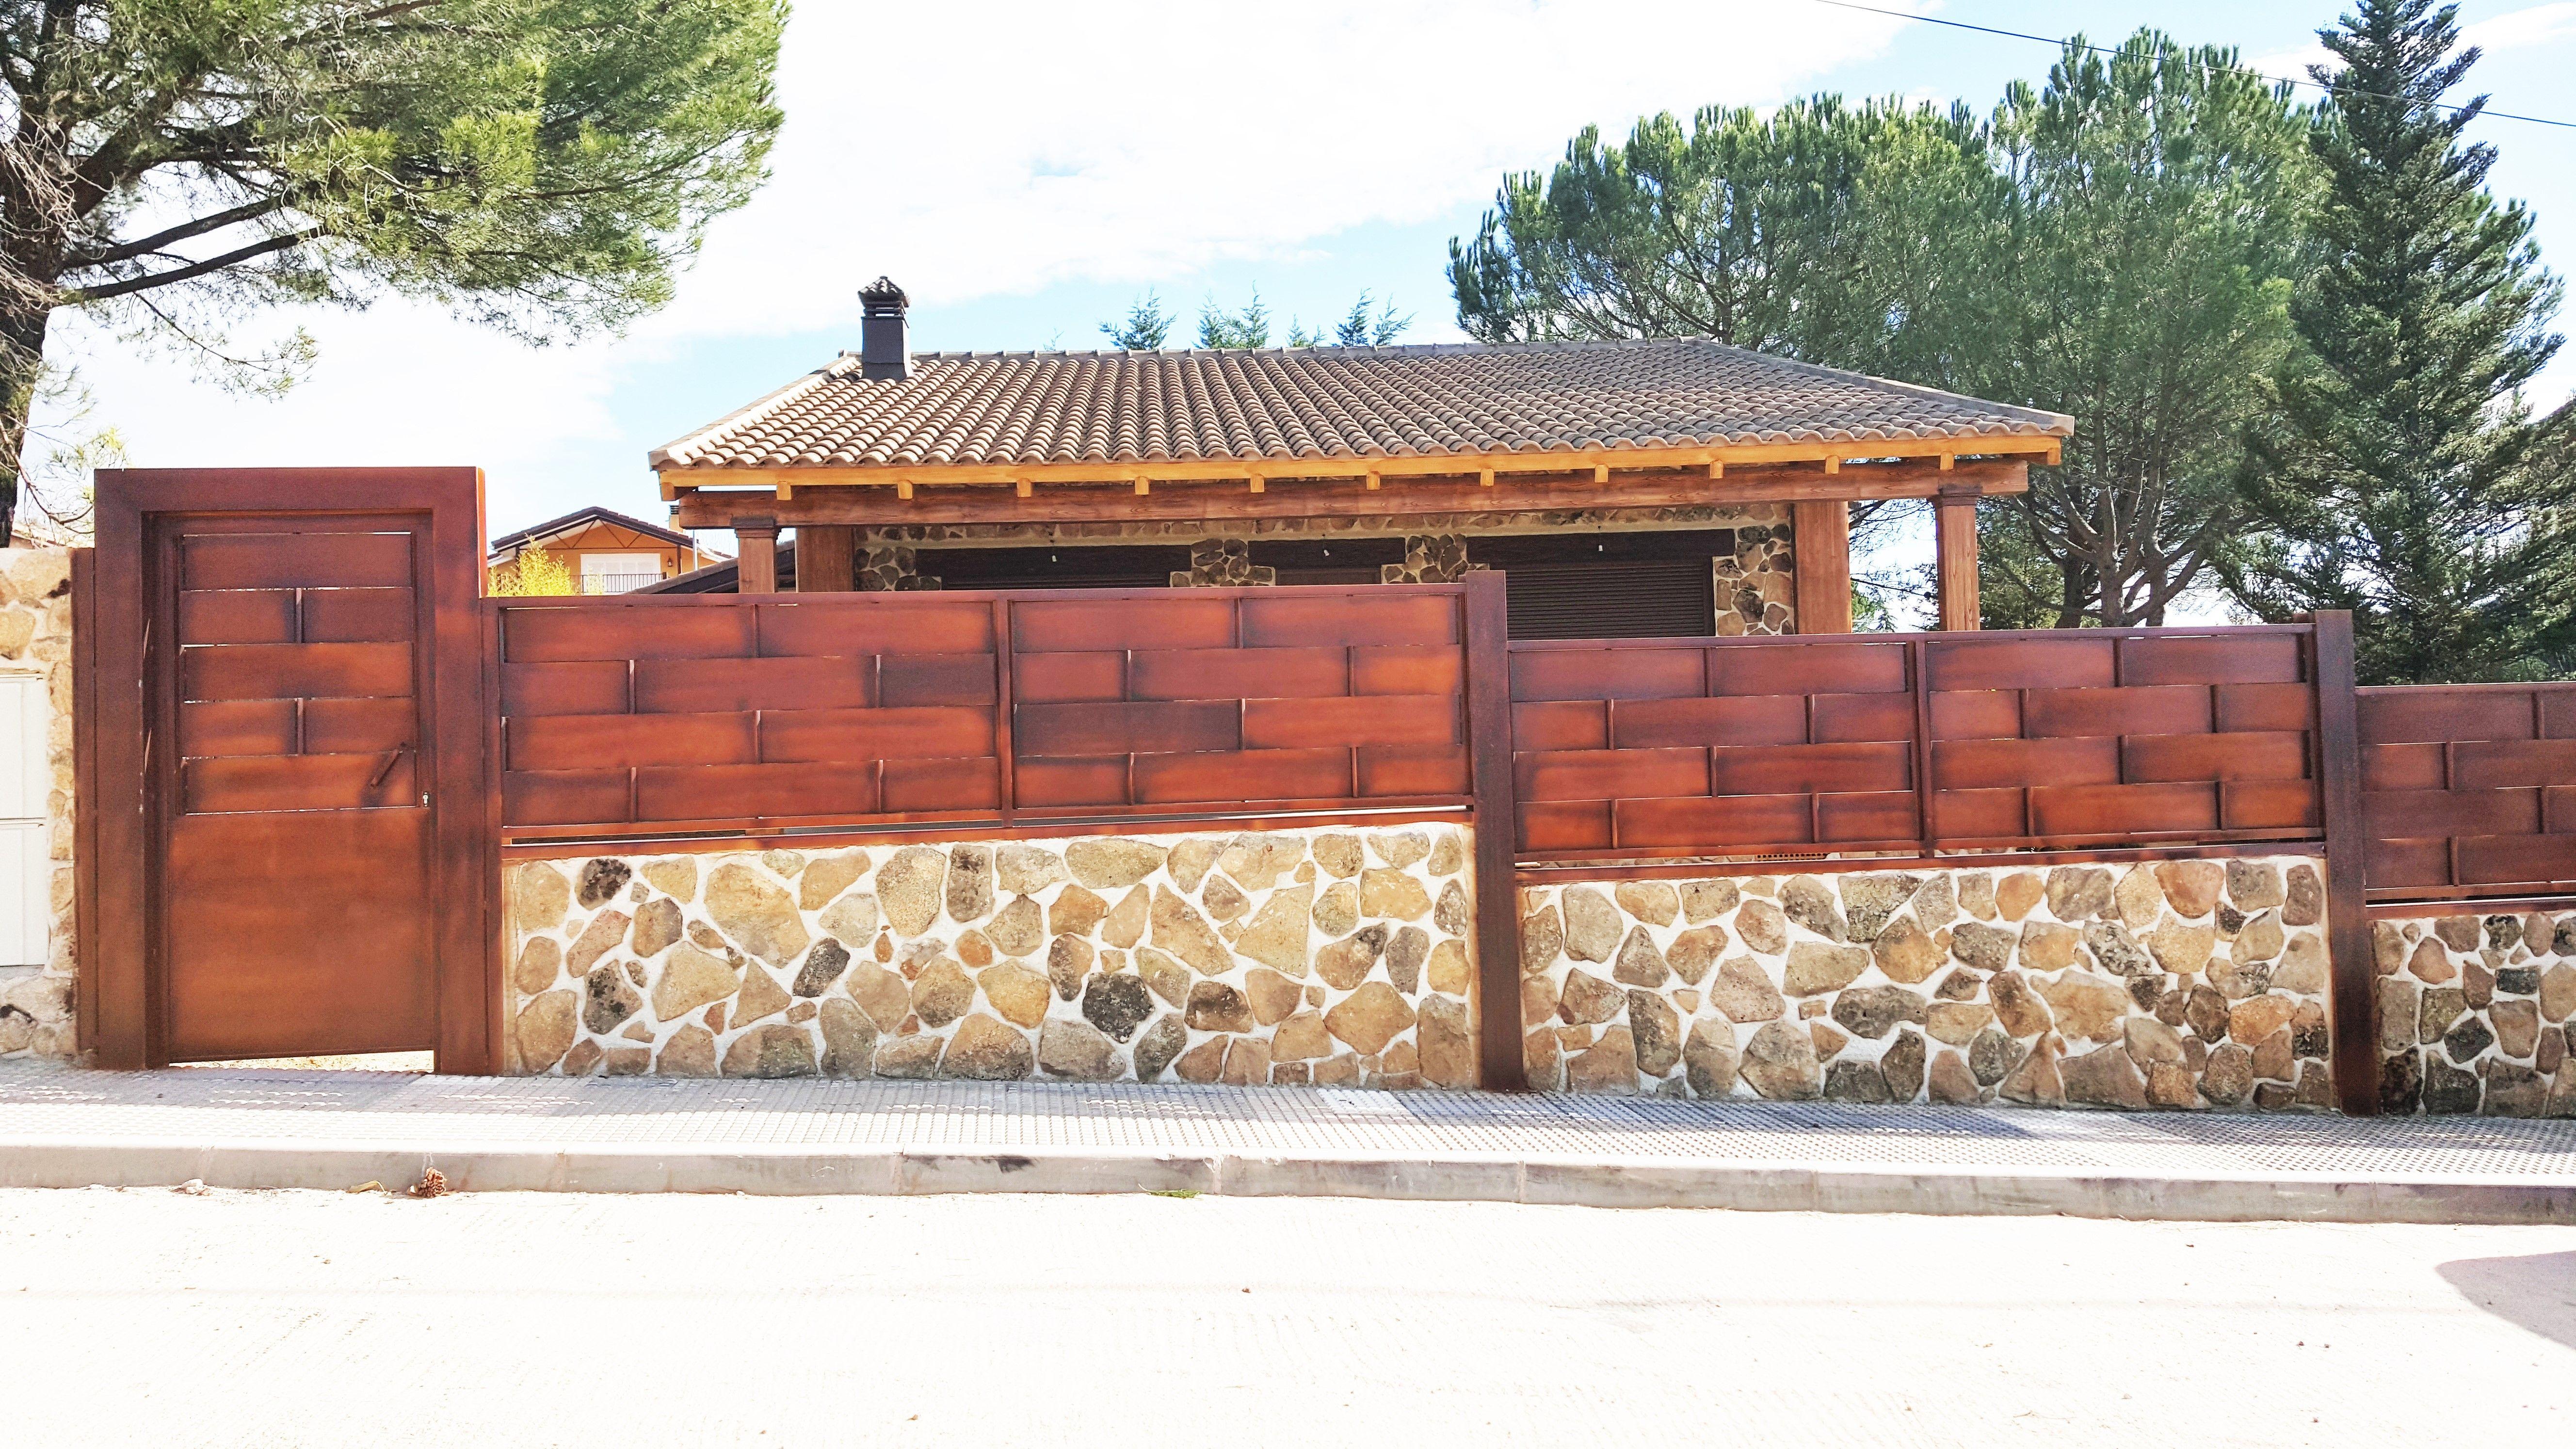 Cerramiento ideal para estetica de casa de campo casas de for Casas de campo prefabricadas